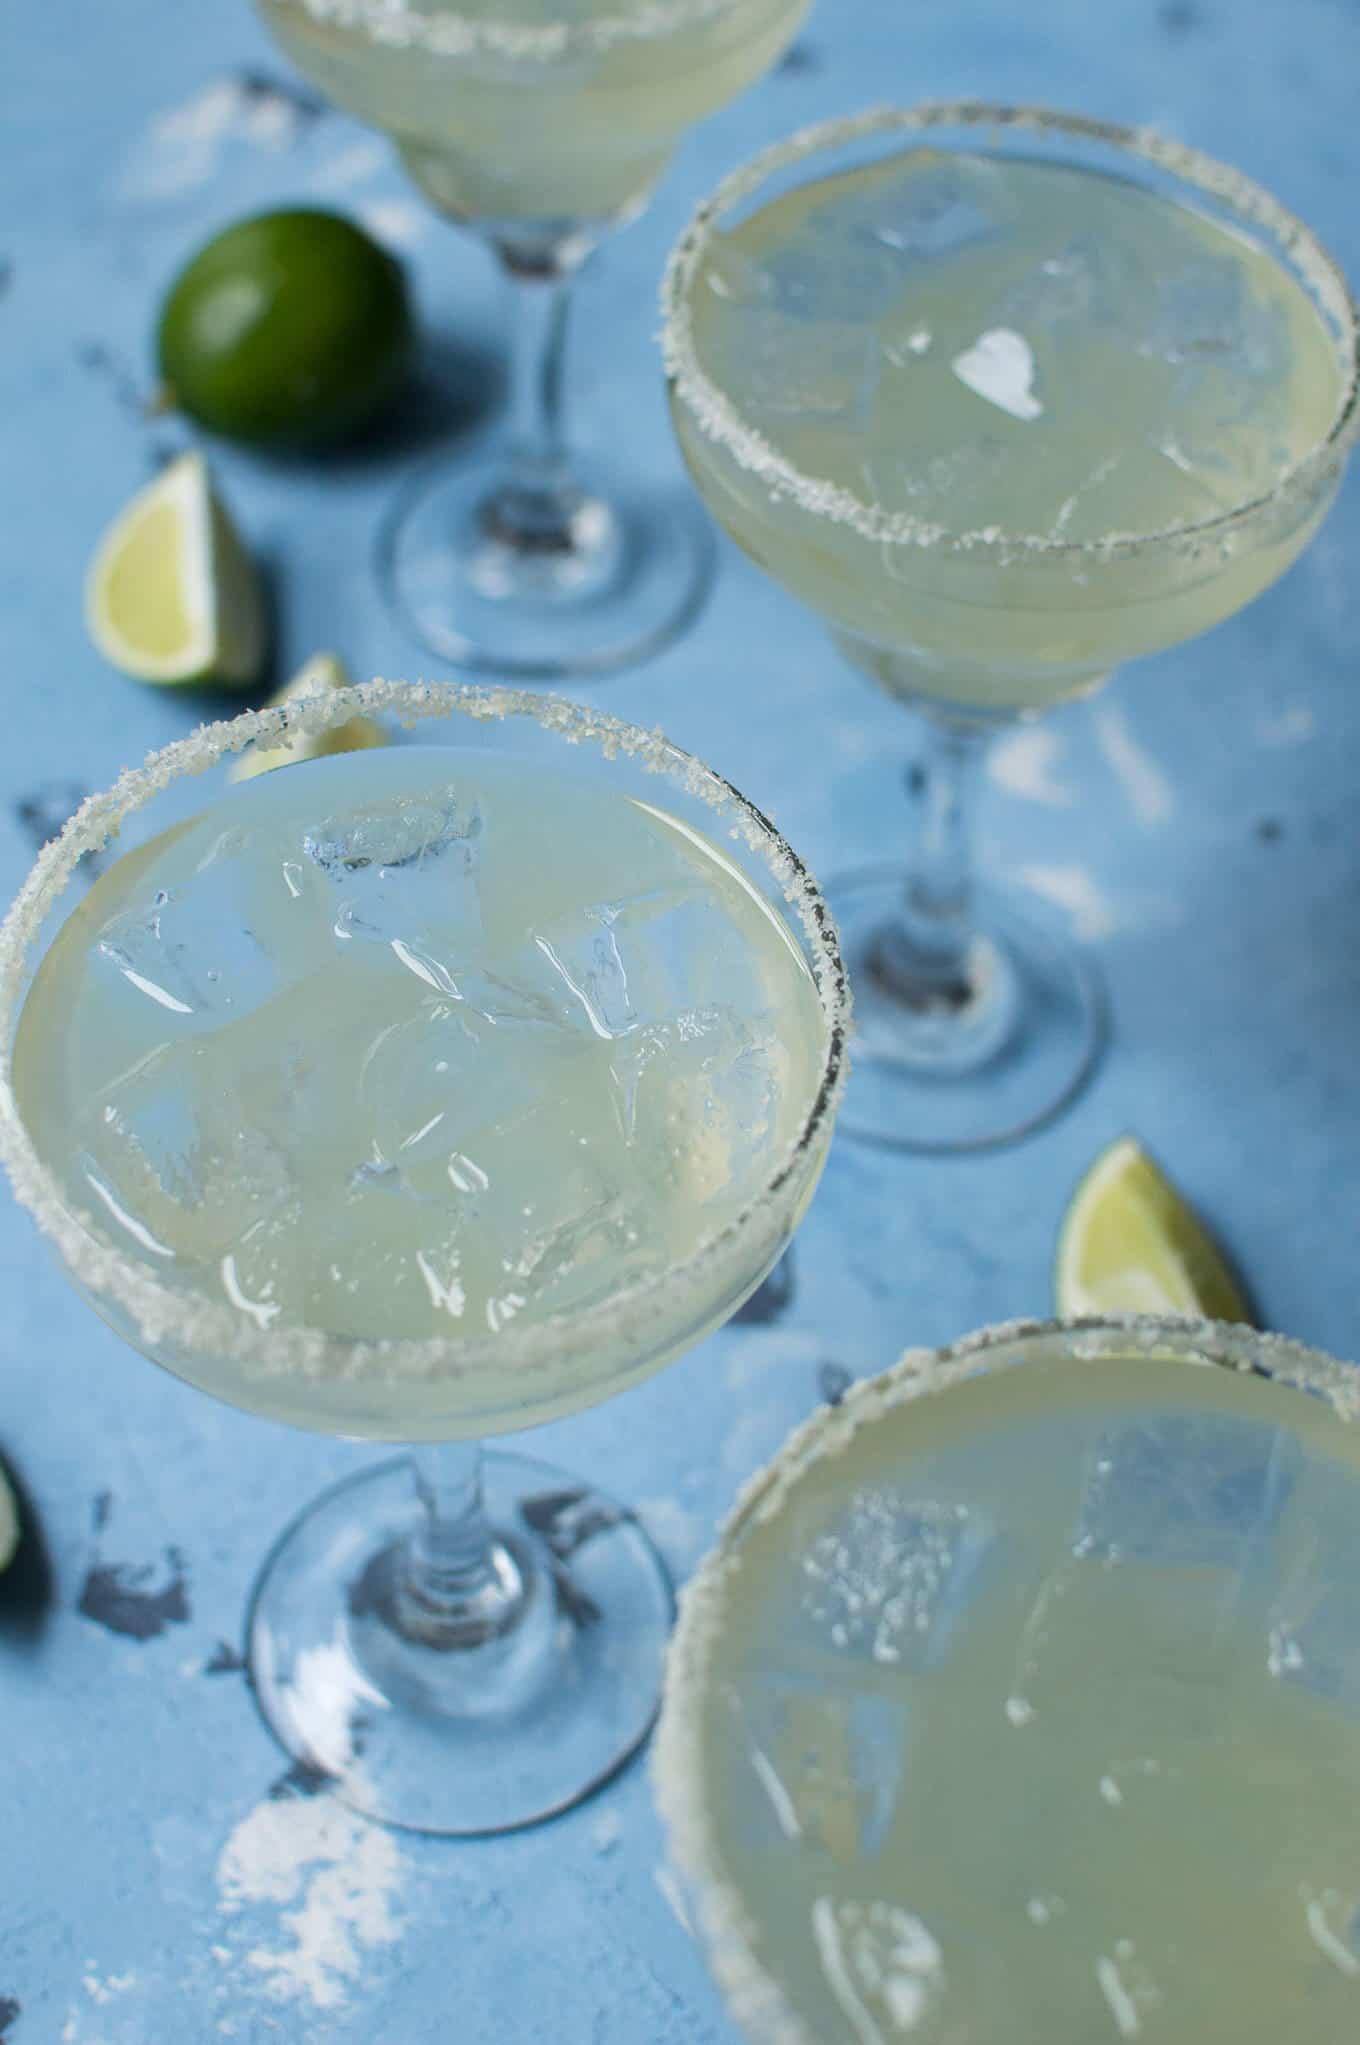 Celebrating Cinco de Mayo with Pitcher Margaritas | omgfood.com